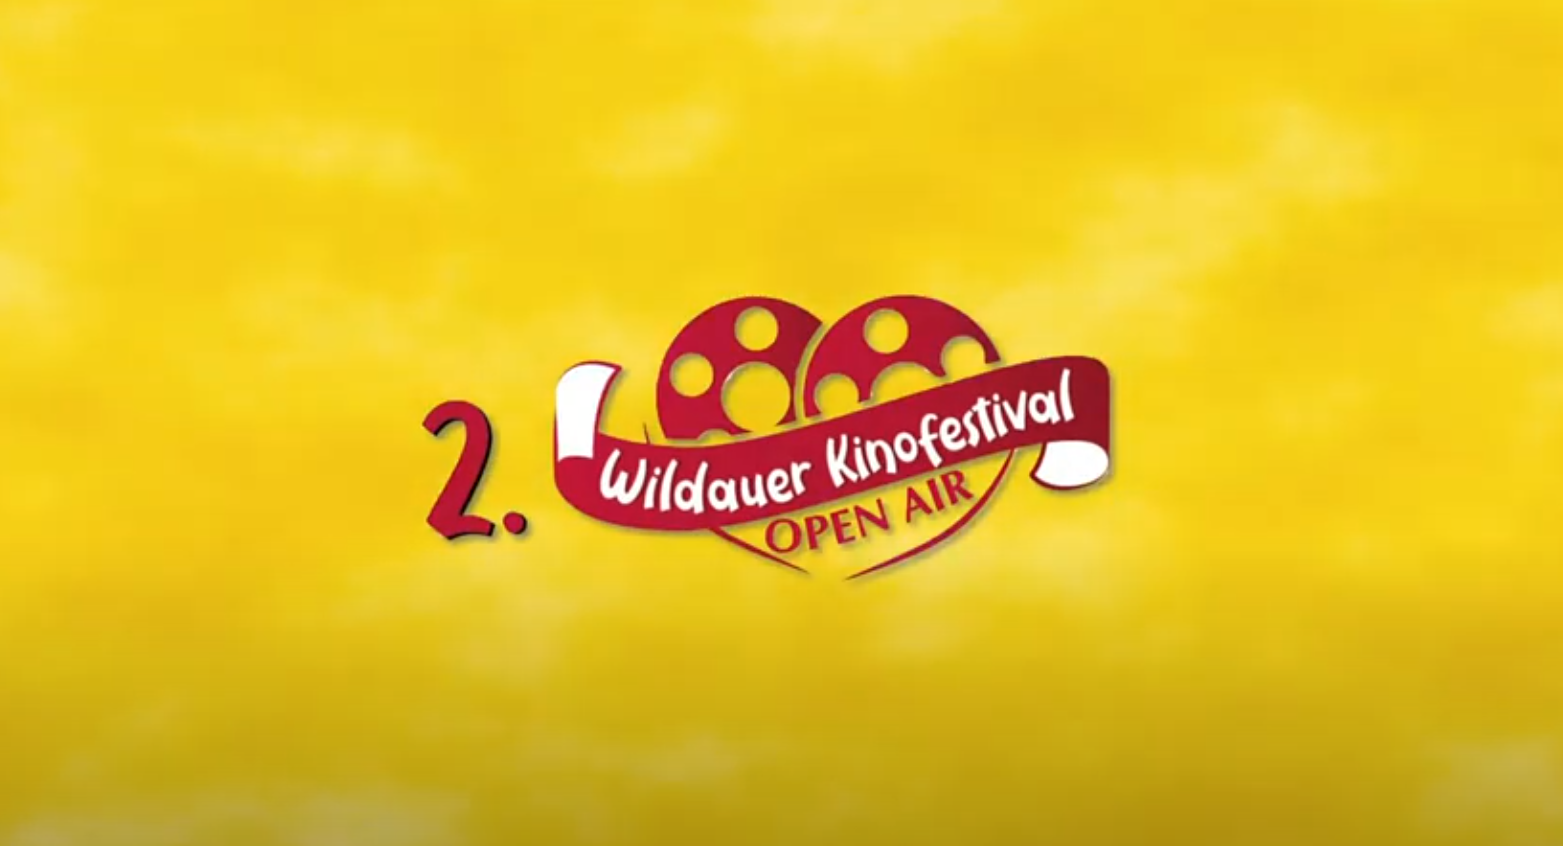 Cinestar Wildau Programm